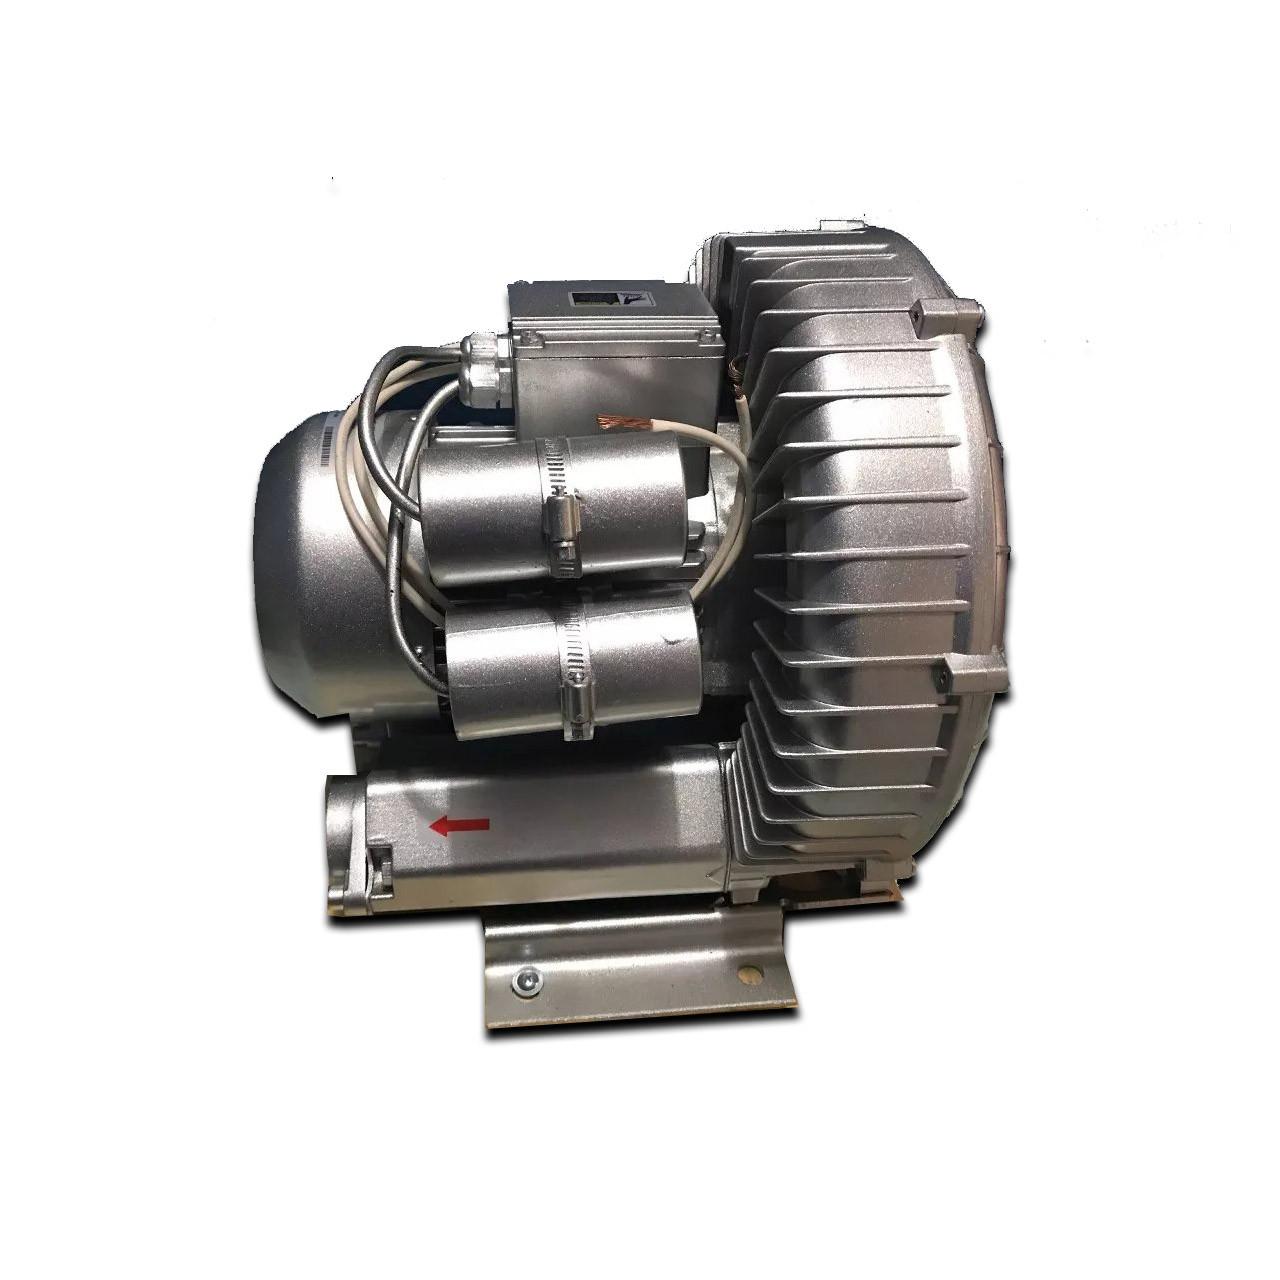 Blower aireador industrial regenerativo 10 HP Nanrong